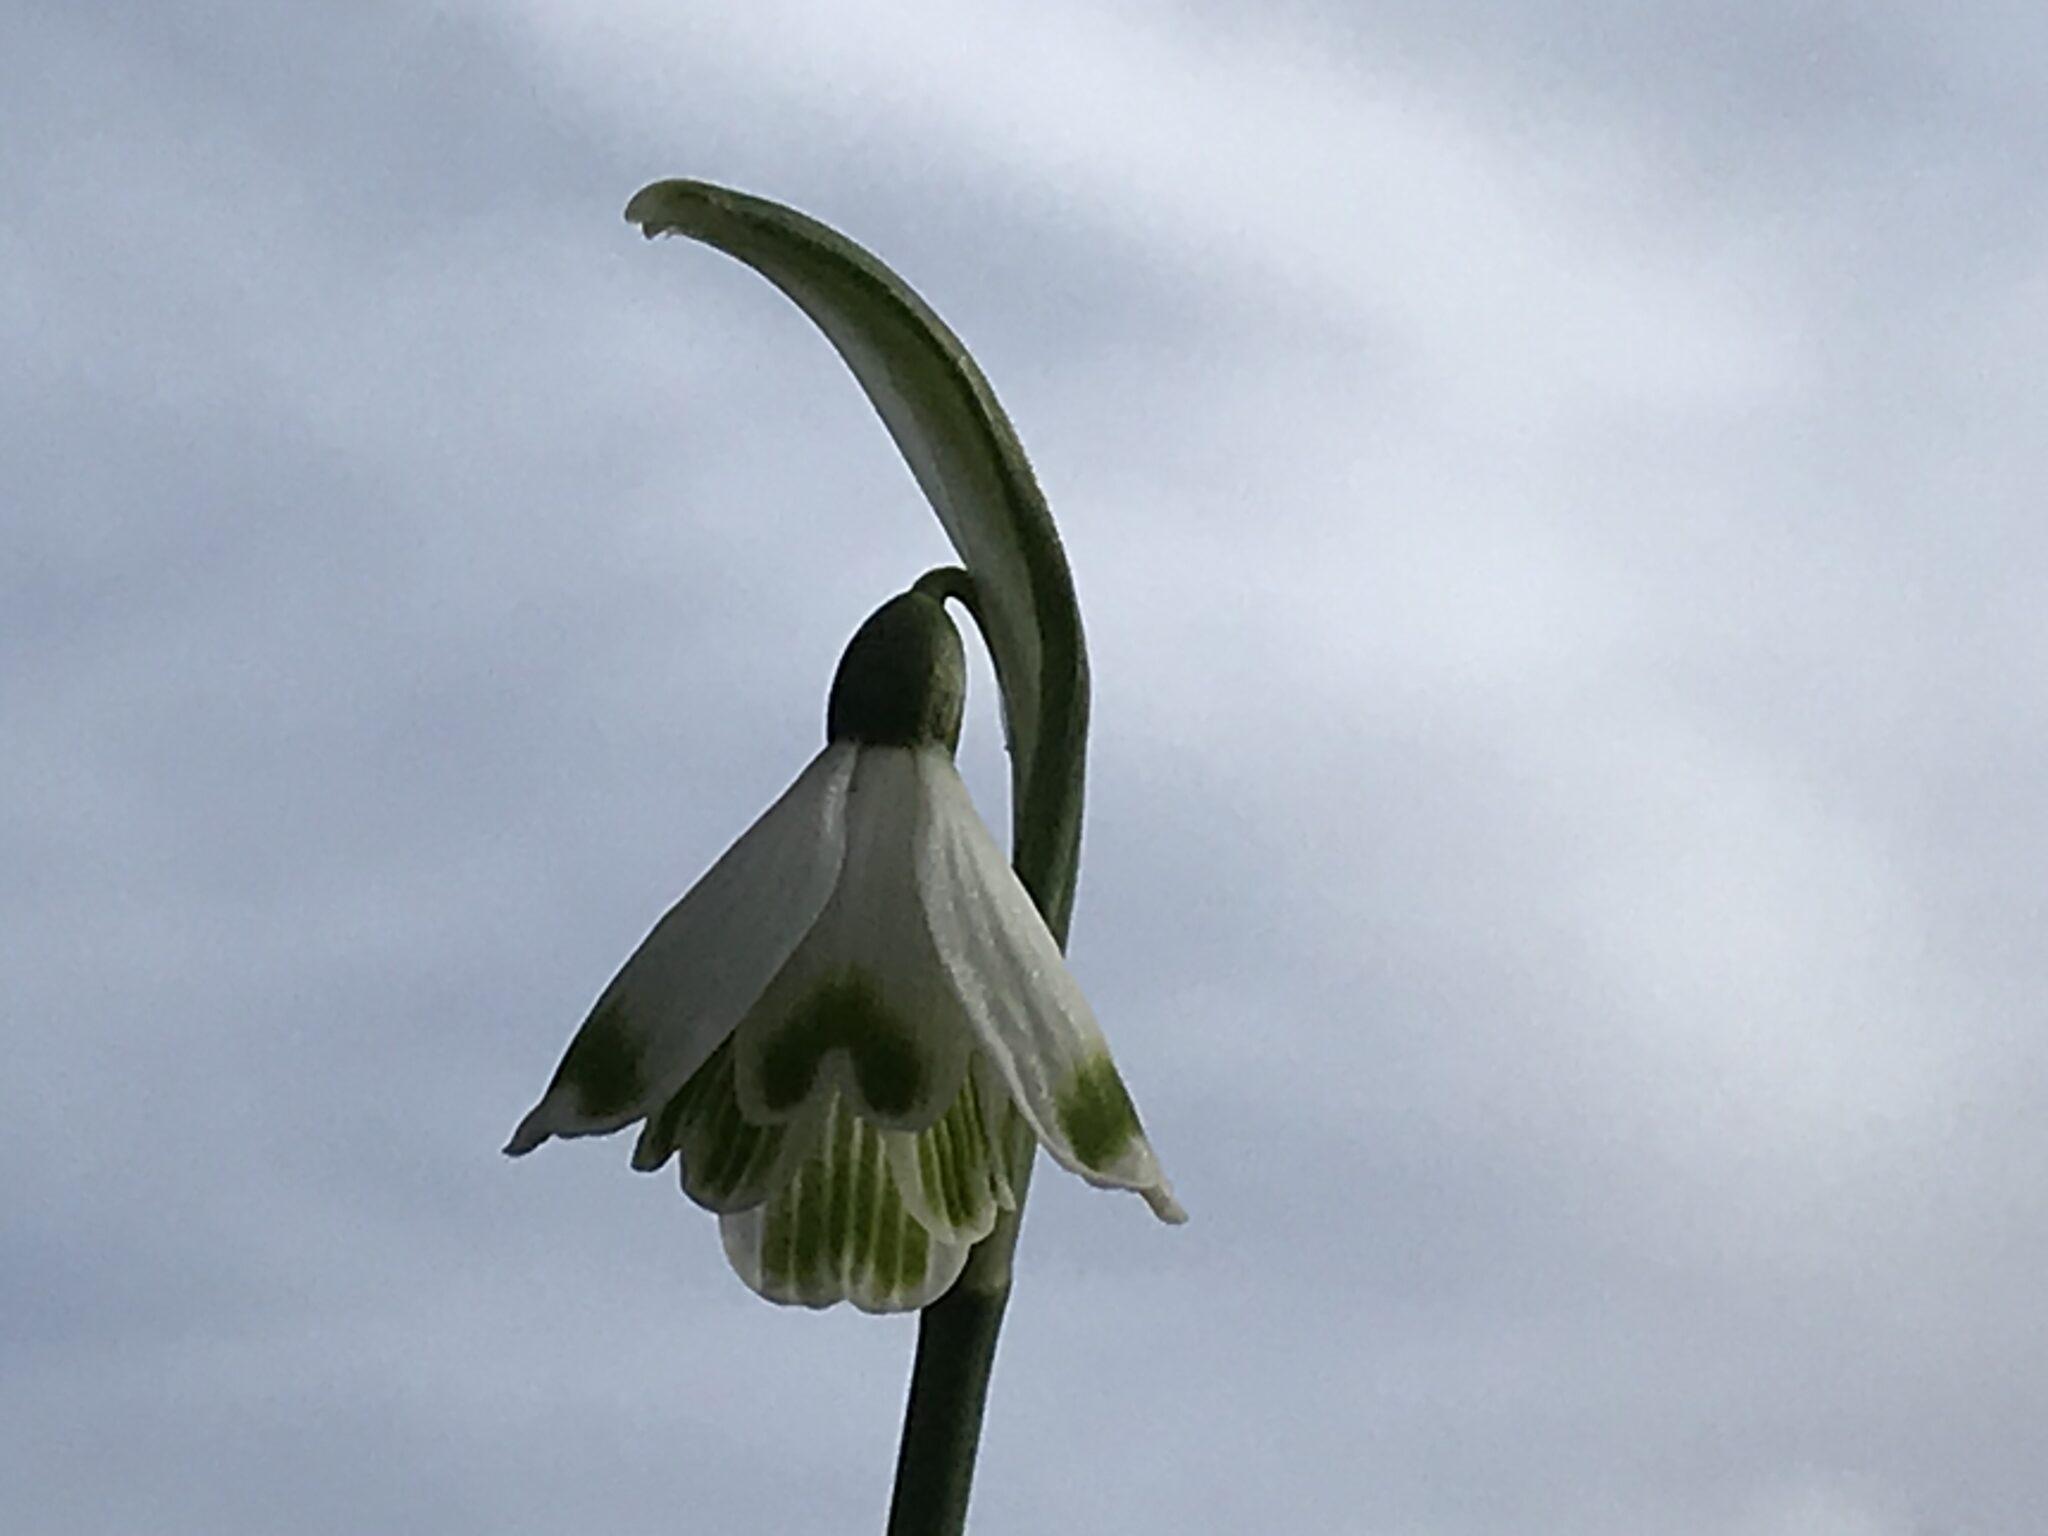 galanthus_nivalis_bell_star5_morlas_plants